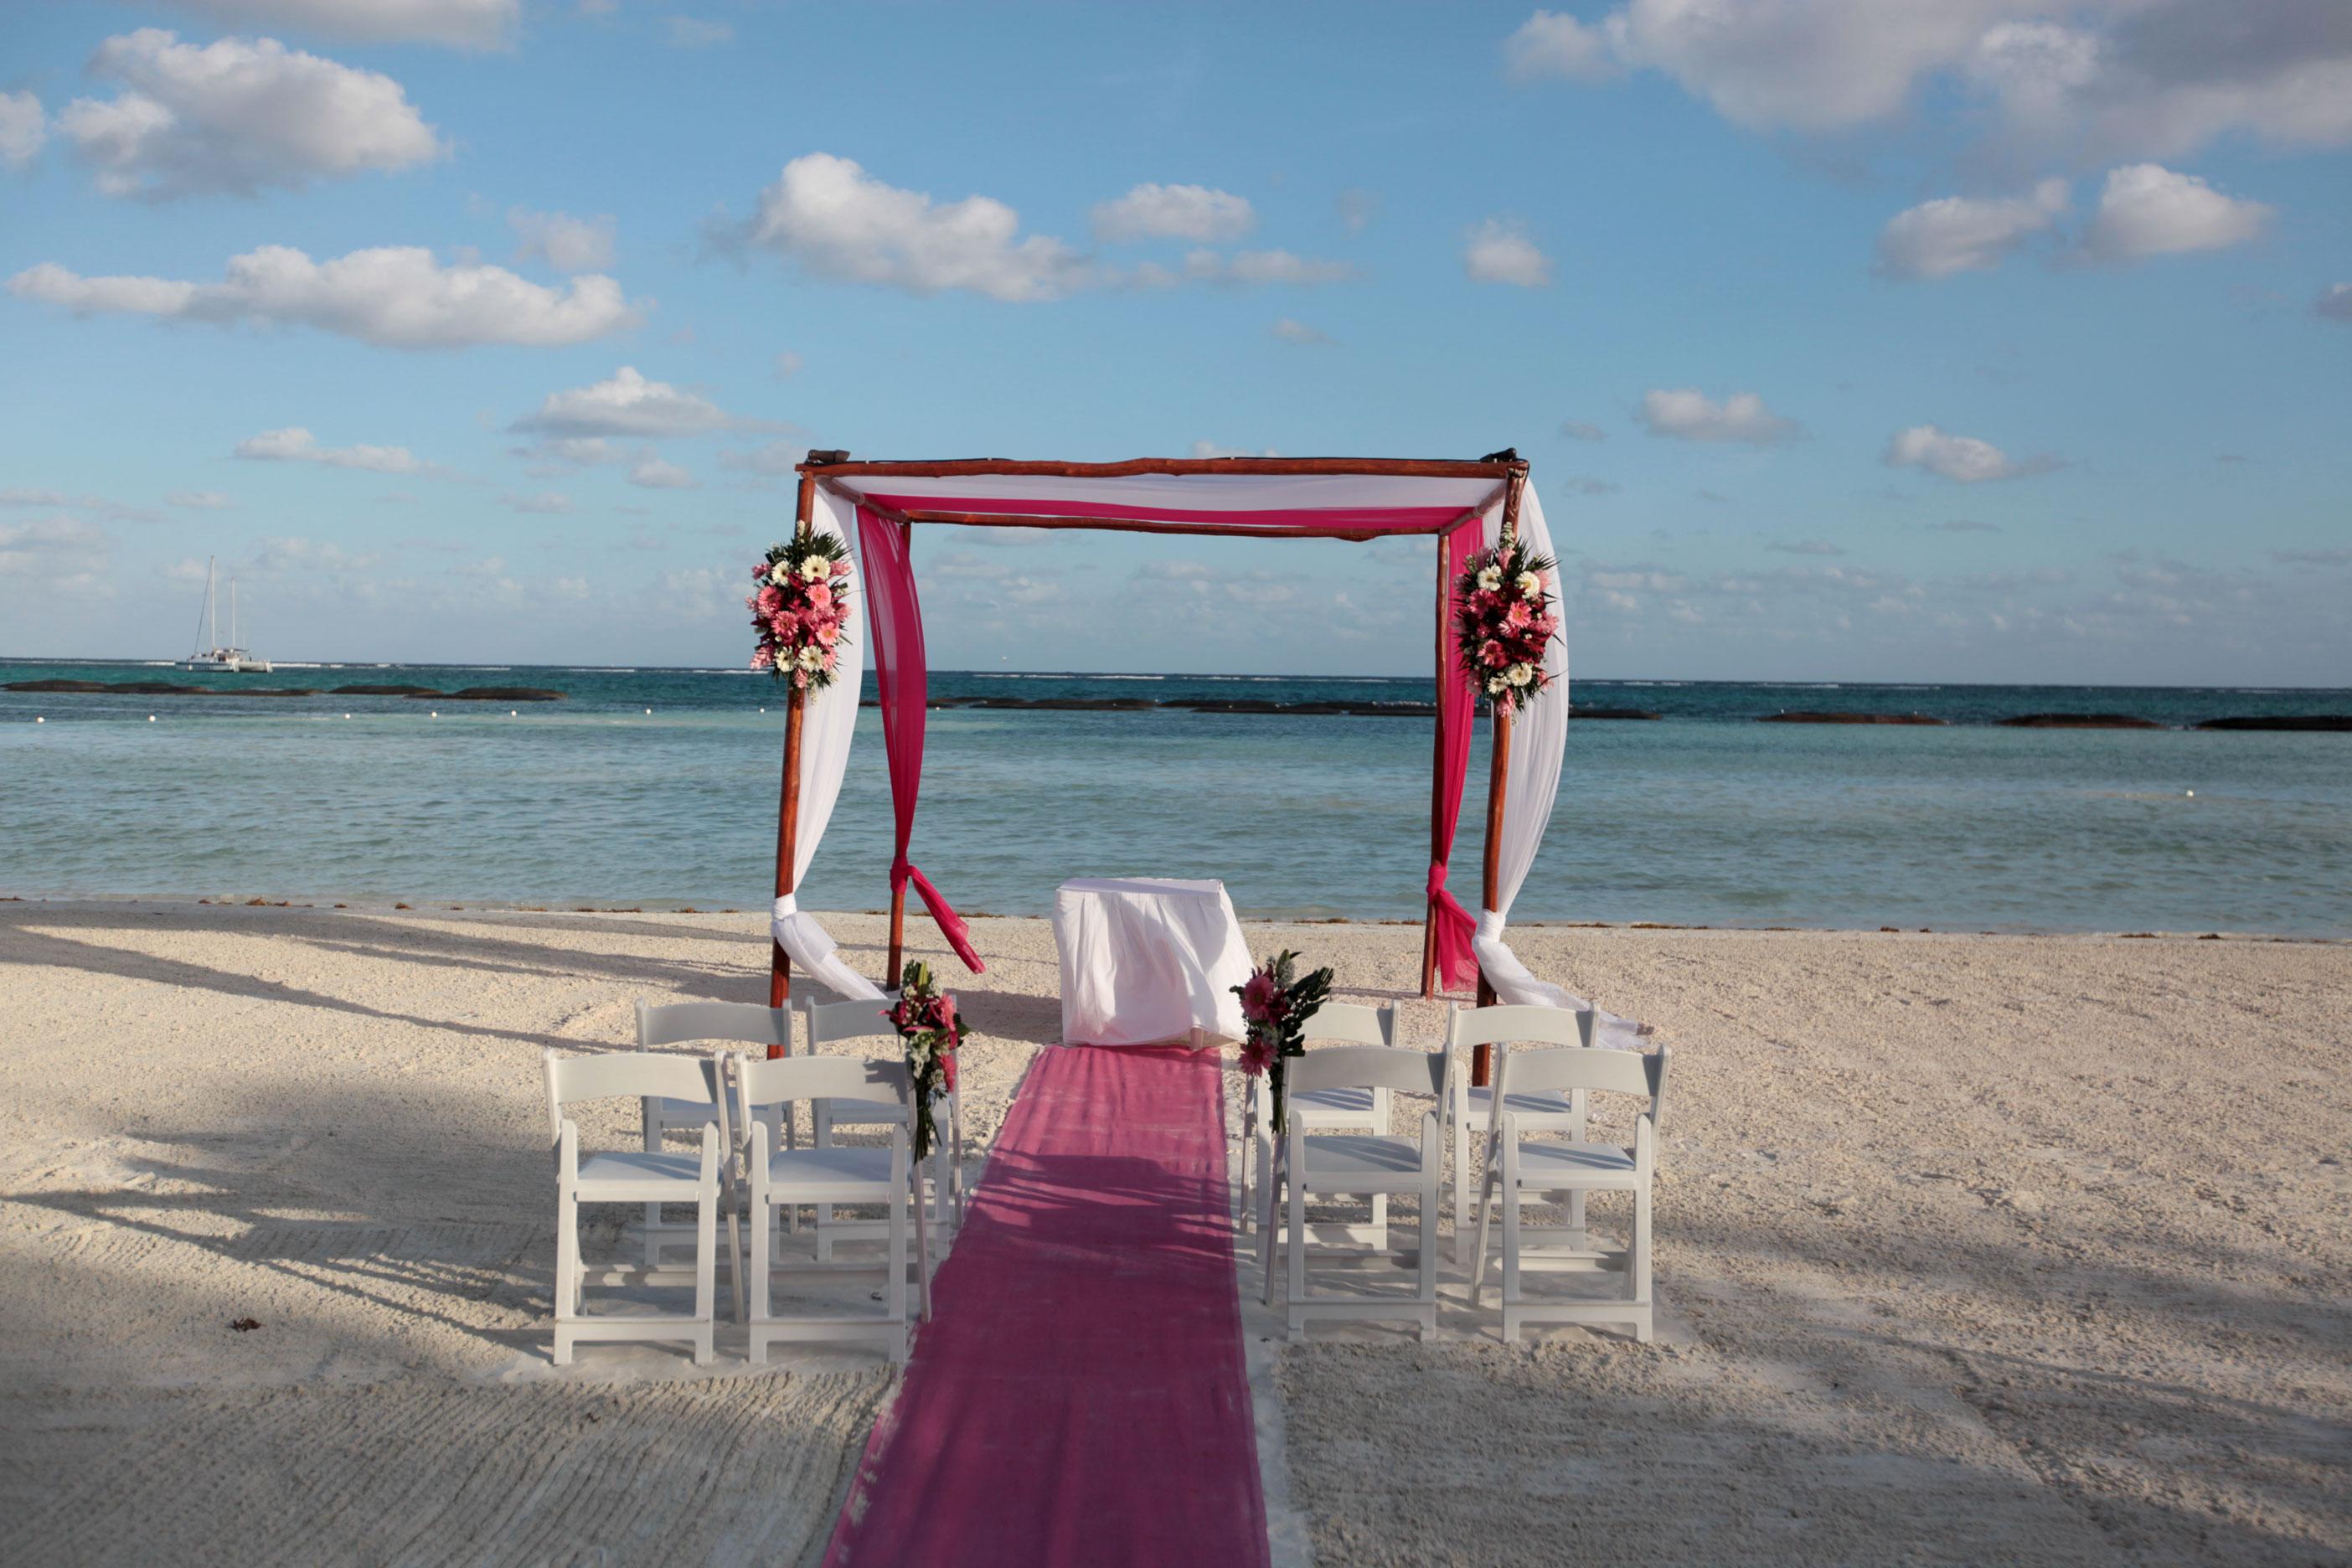 Gazebo-on-the-beach-small-wedding